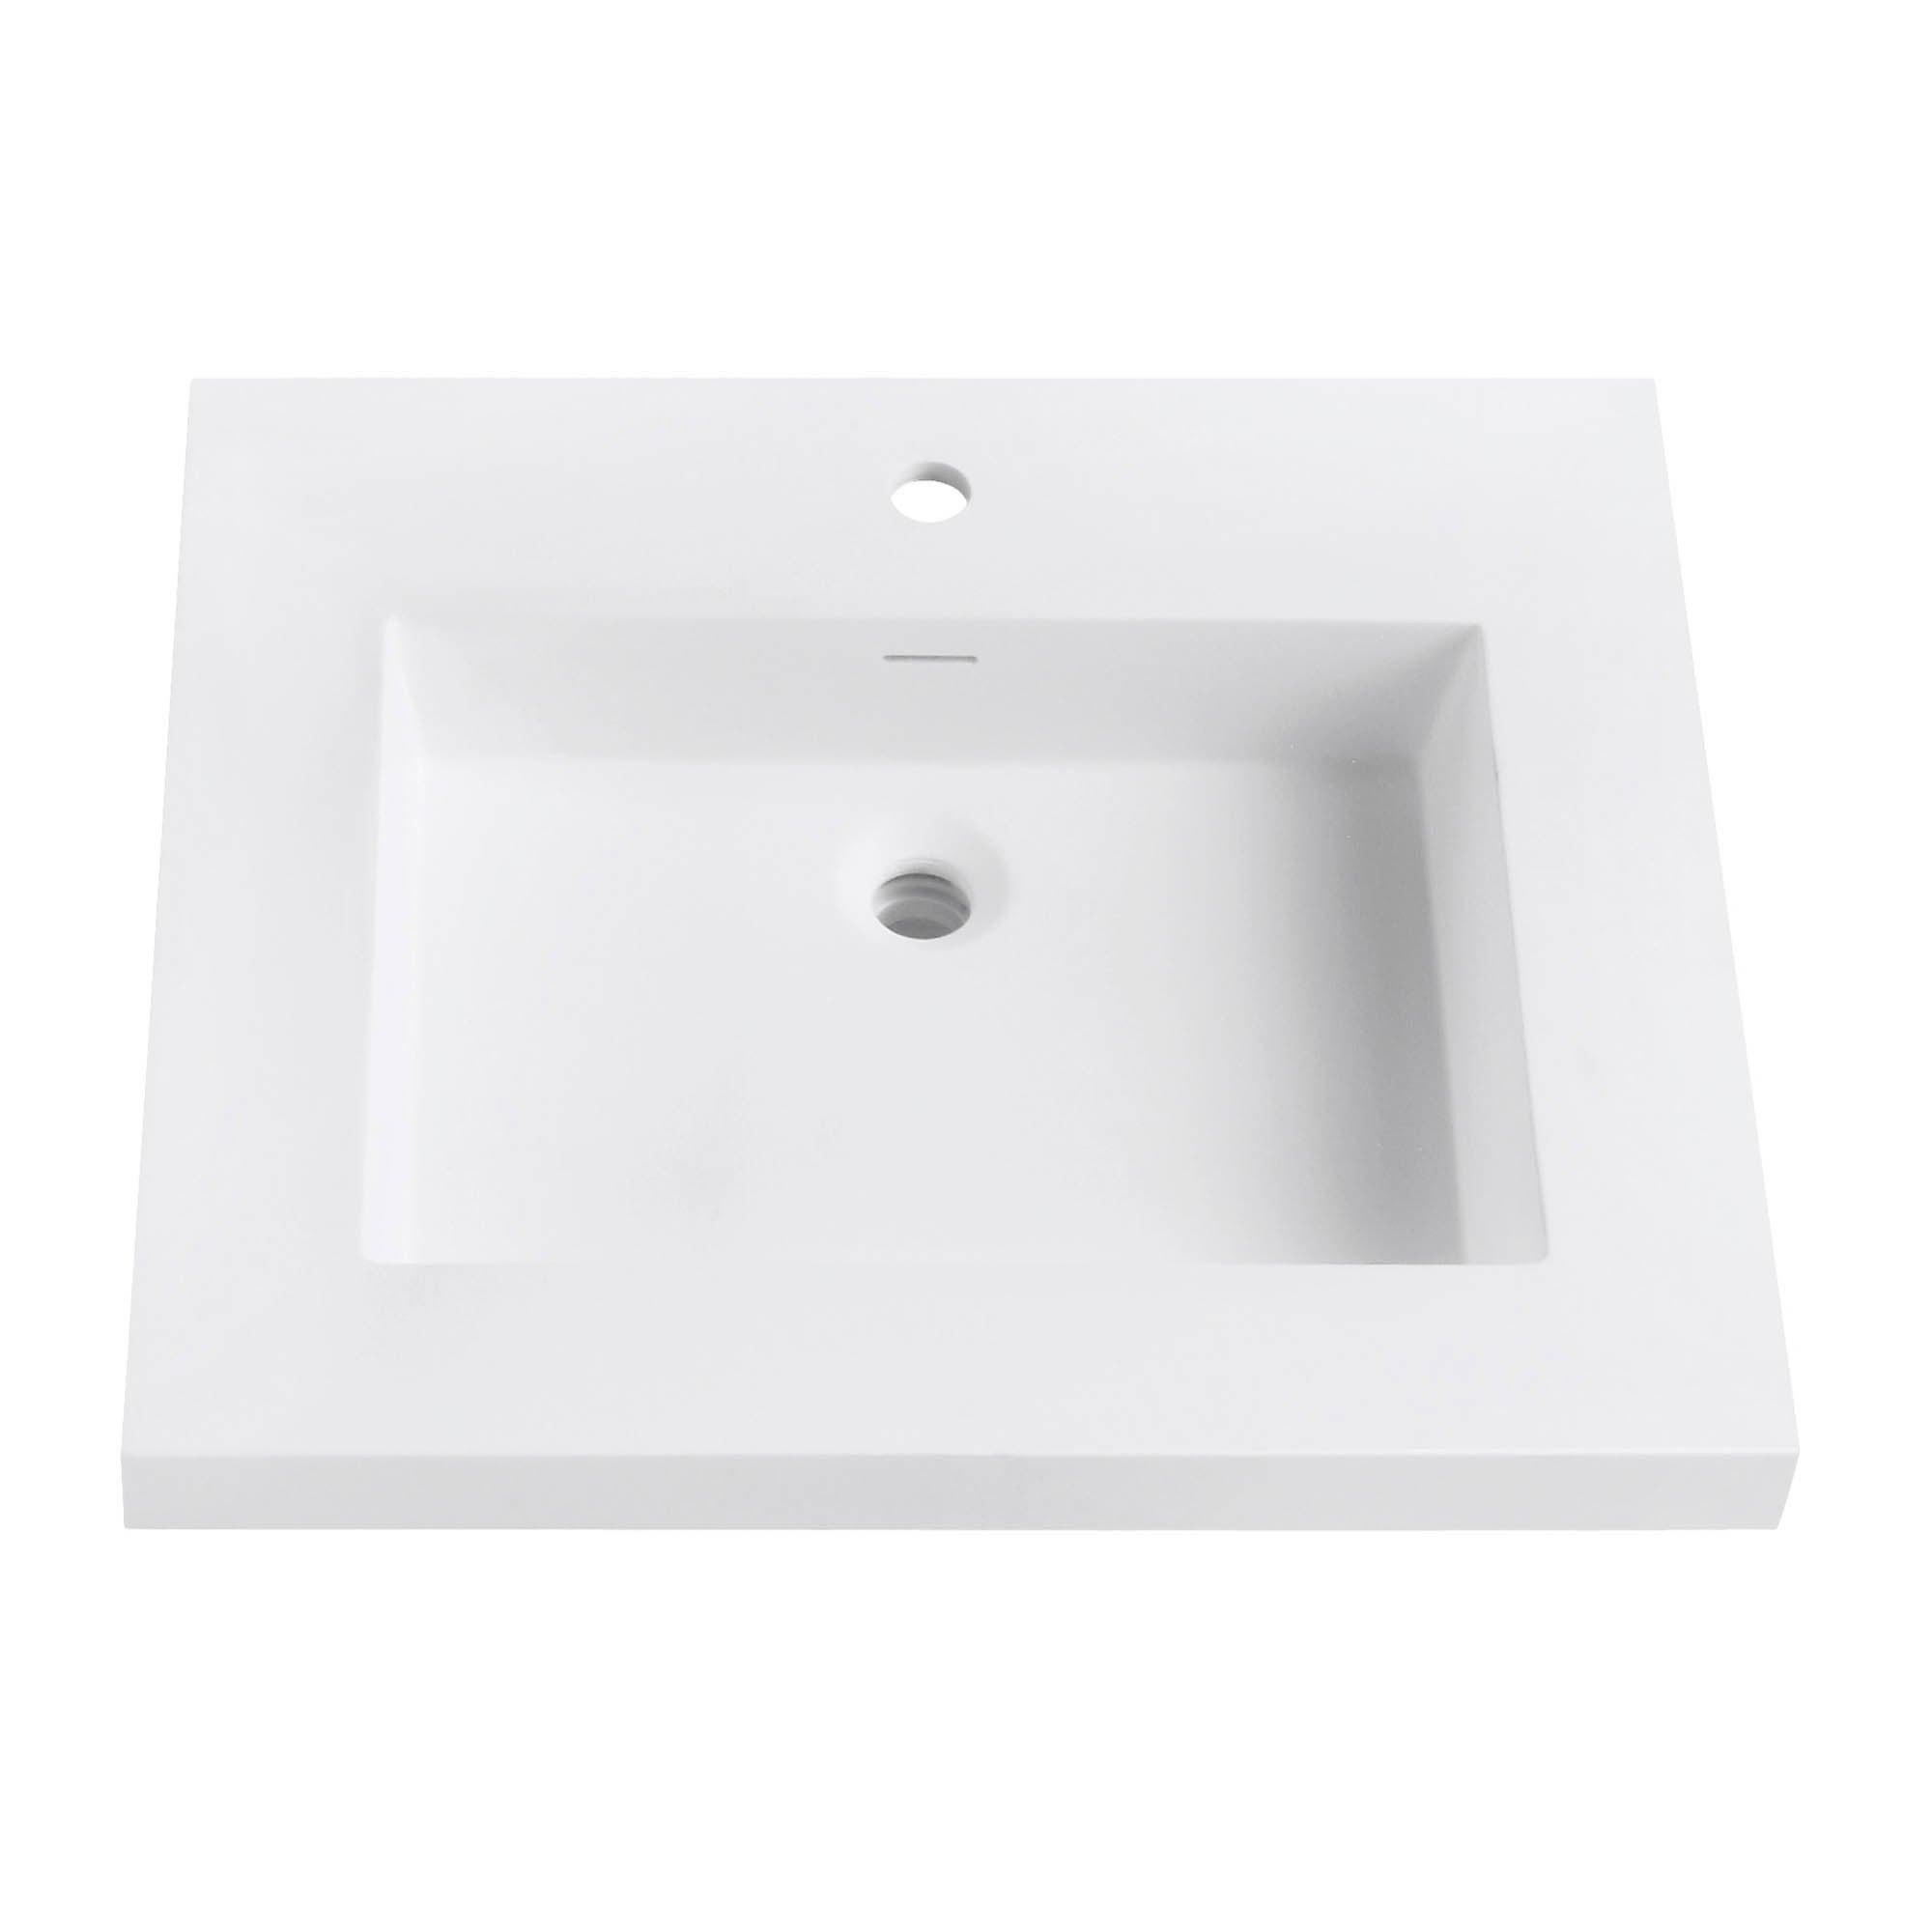 Shop Avanity VersaStone 25 Inch Solid Surface Vanity Top   Free Shipping  Today   Overstock.com   11065575